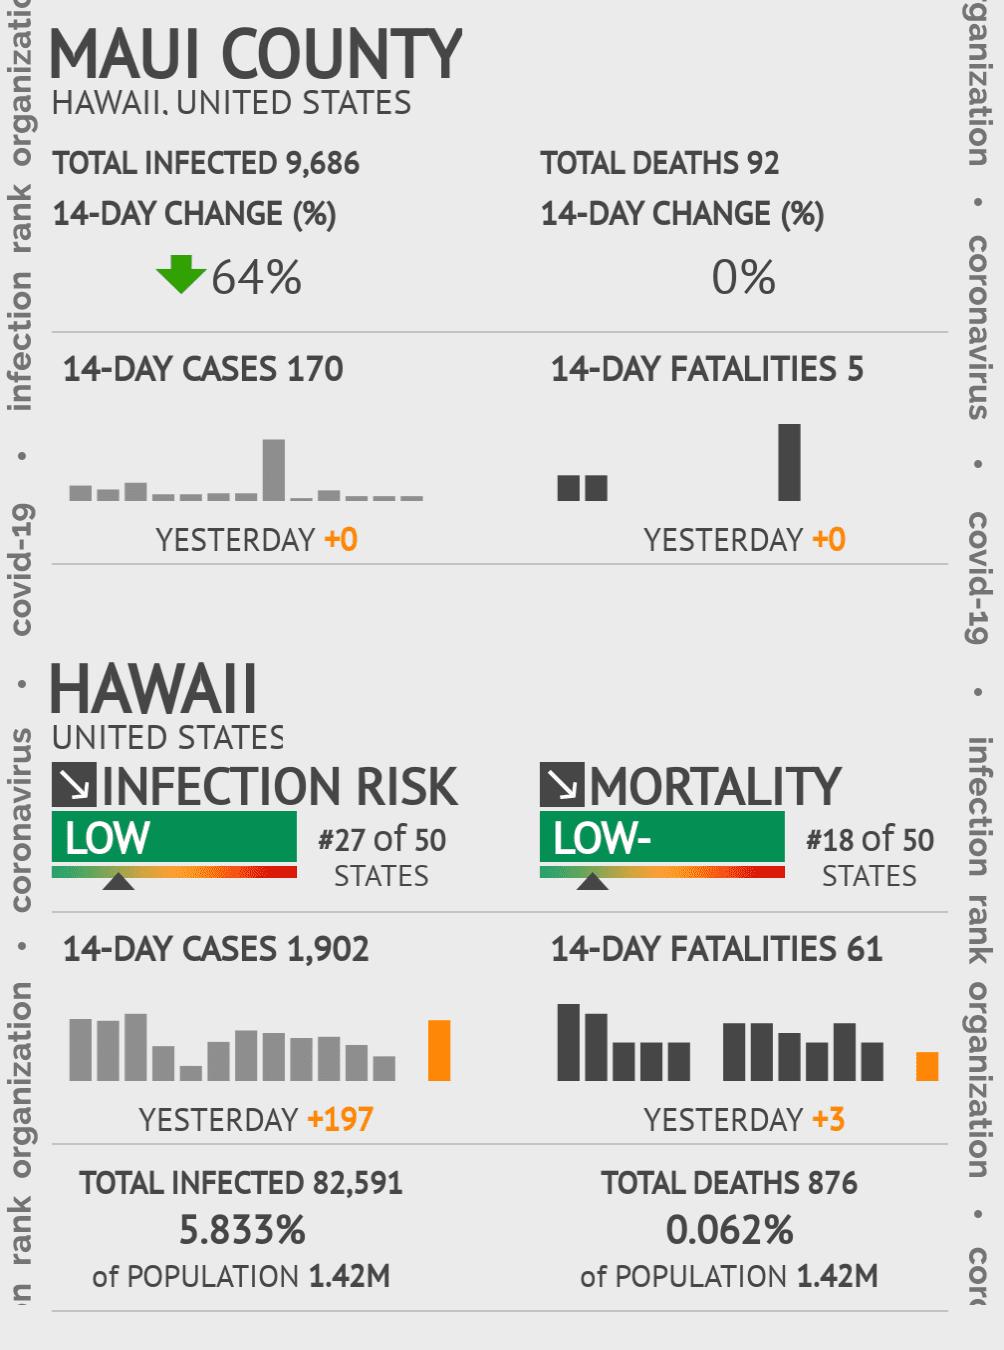 Maui County Coronavirus Covid-19 Risk of Infection on July 24, 2021